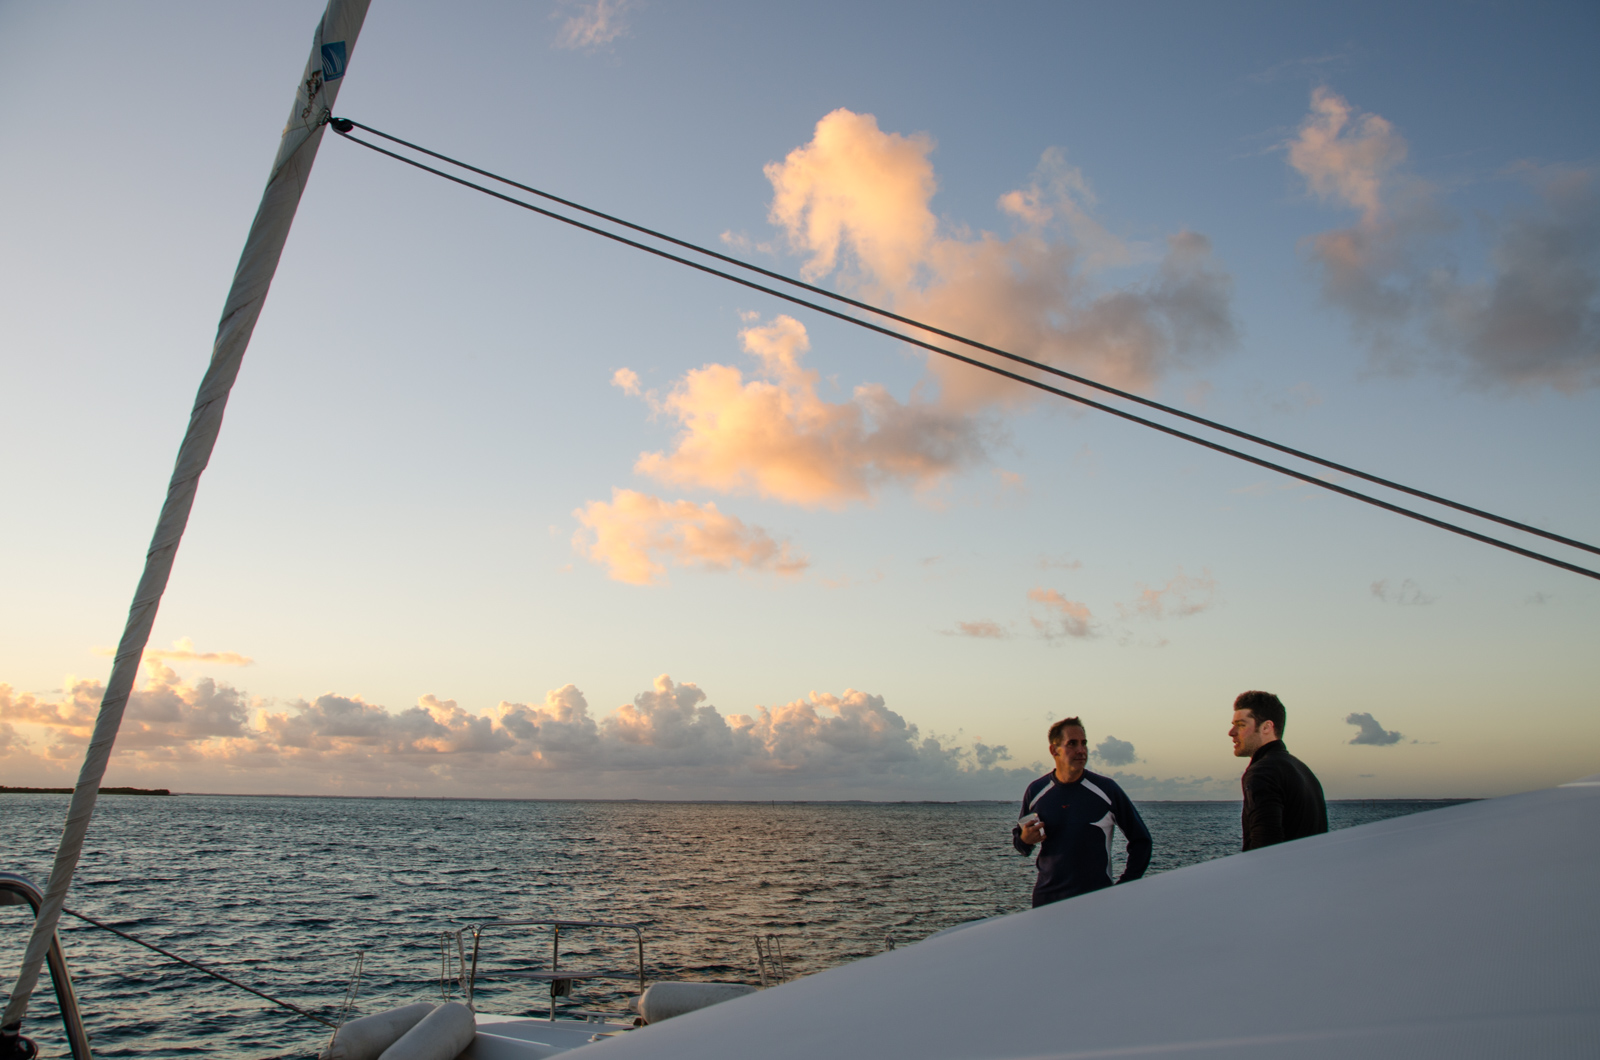 Jamie & Brett discuss their strategy for a morning swim.